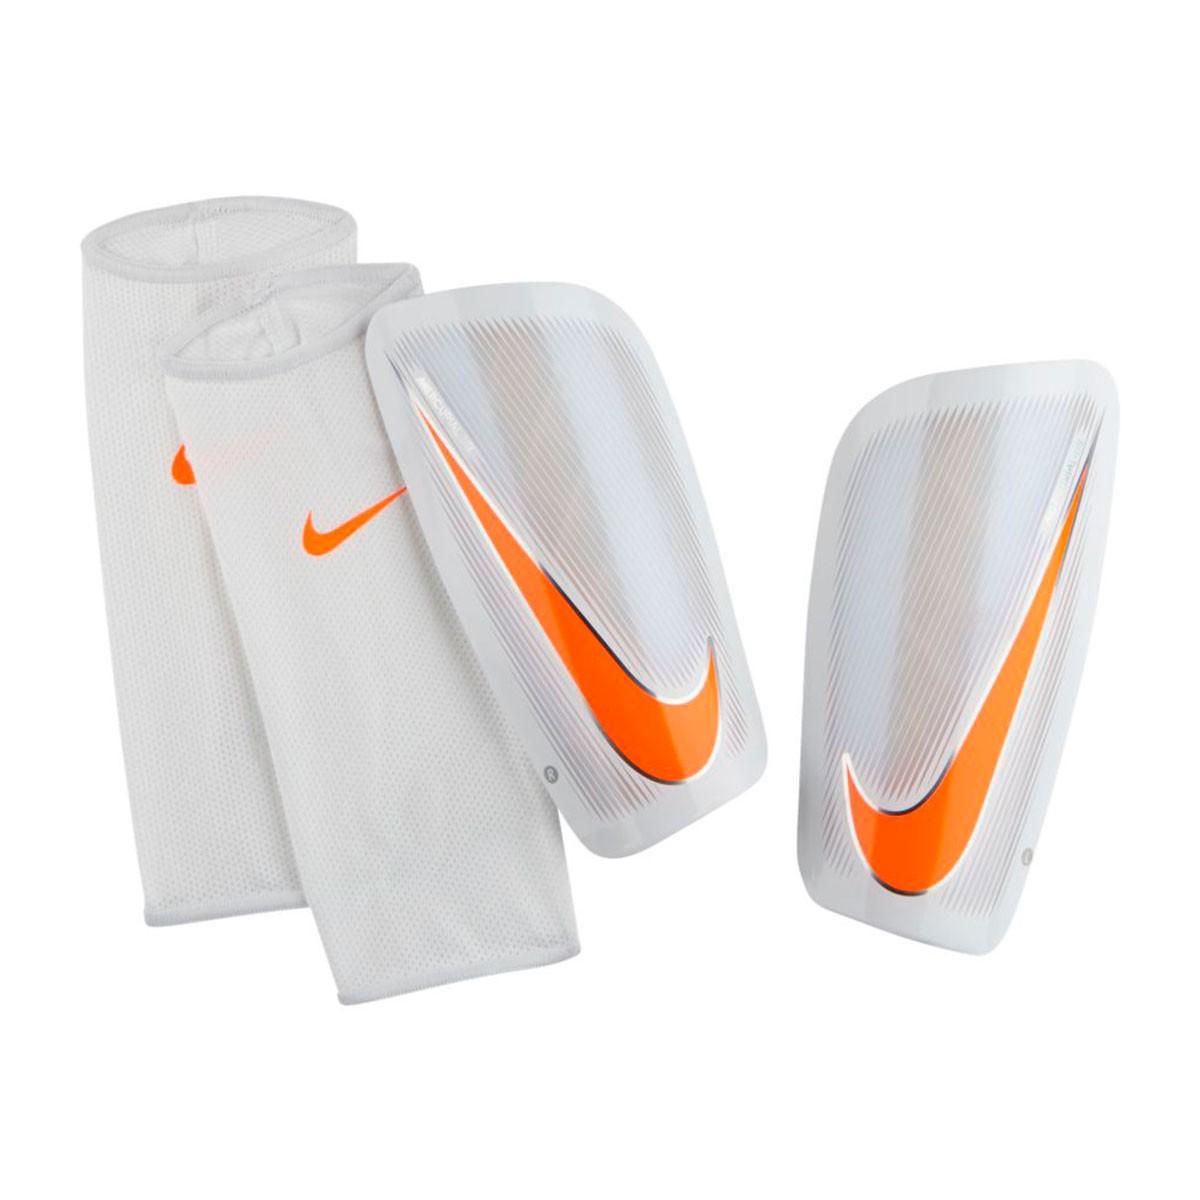 Shinpads Nike Mercurial Lite White-Total orange - Soloporteros es ... 49b4de7bcba